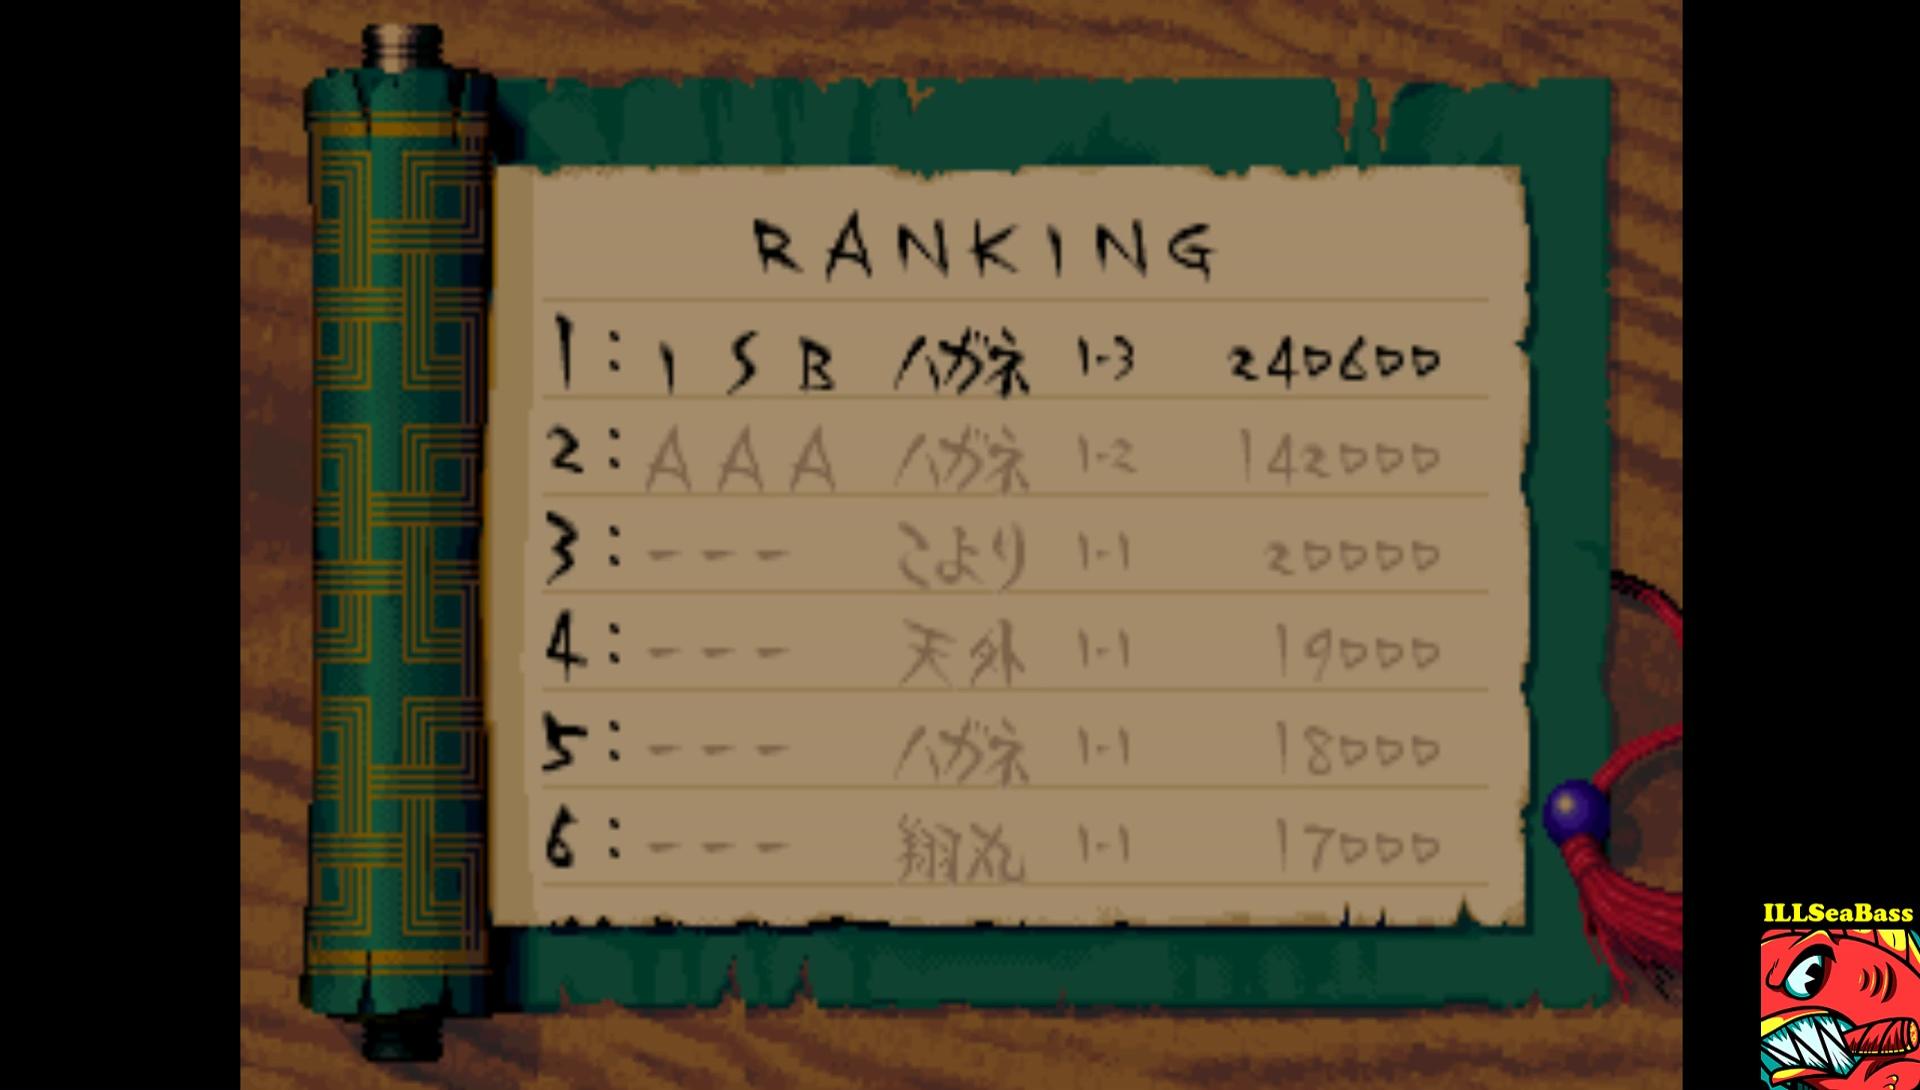 ILLSeaBass: Sengoku Blade: Sengoku Ace Episode II (Arcade Emulated / M.A.M.E.) 240,600 points on 2017-03-13 21:20:09